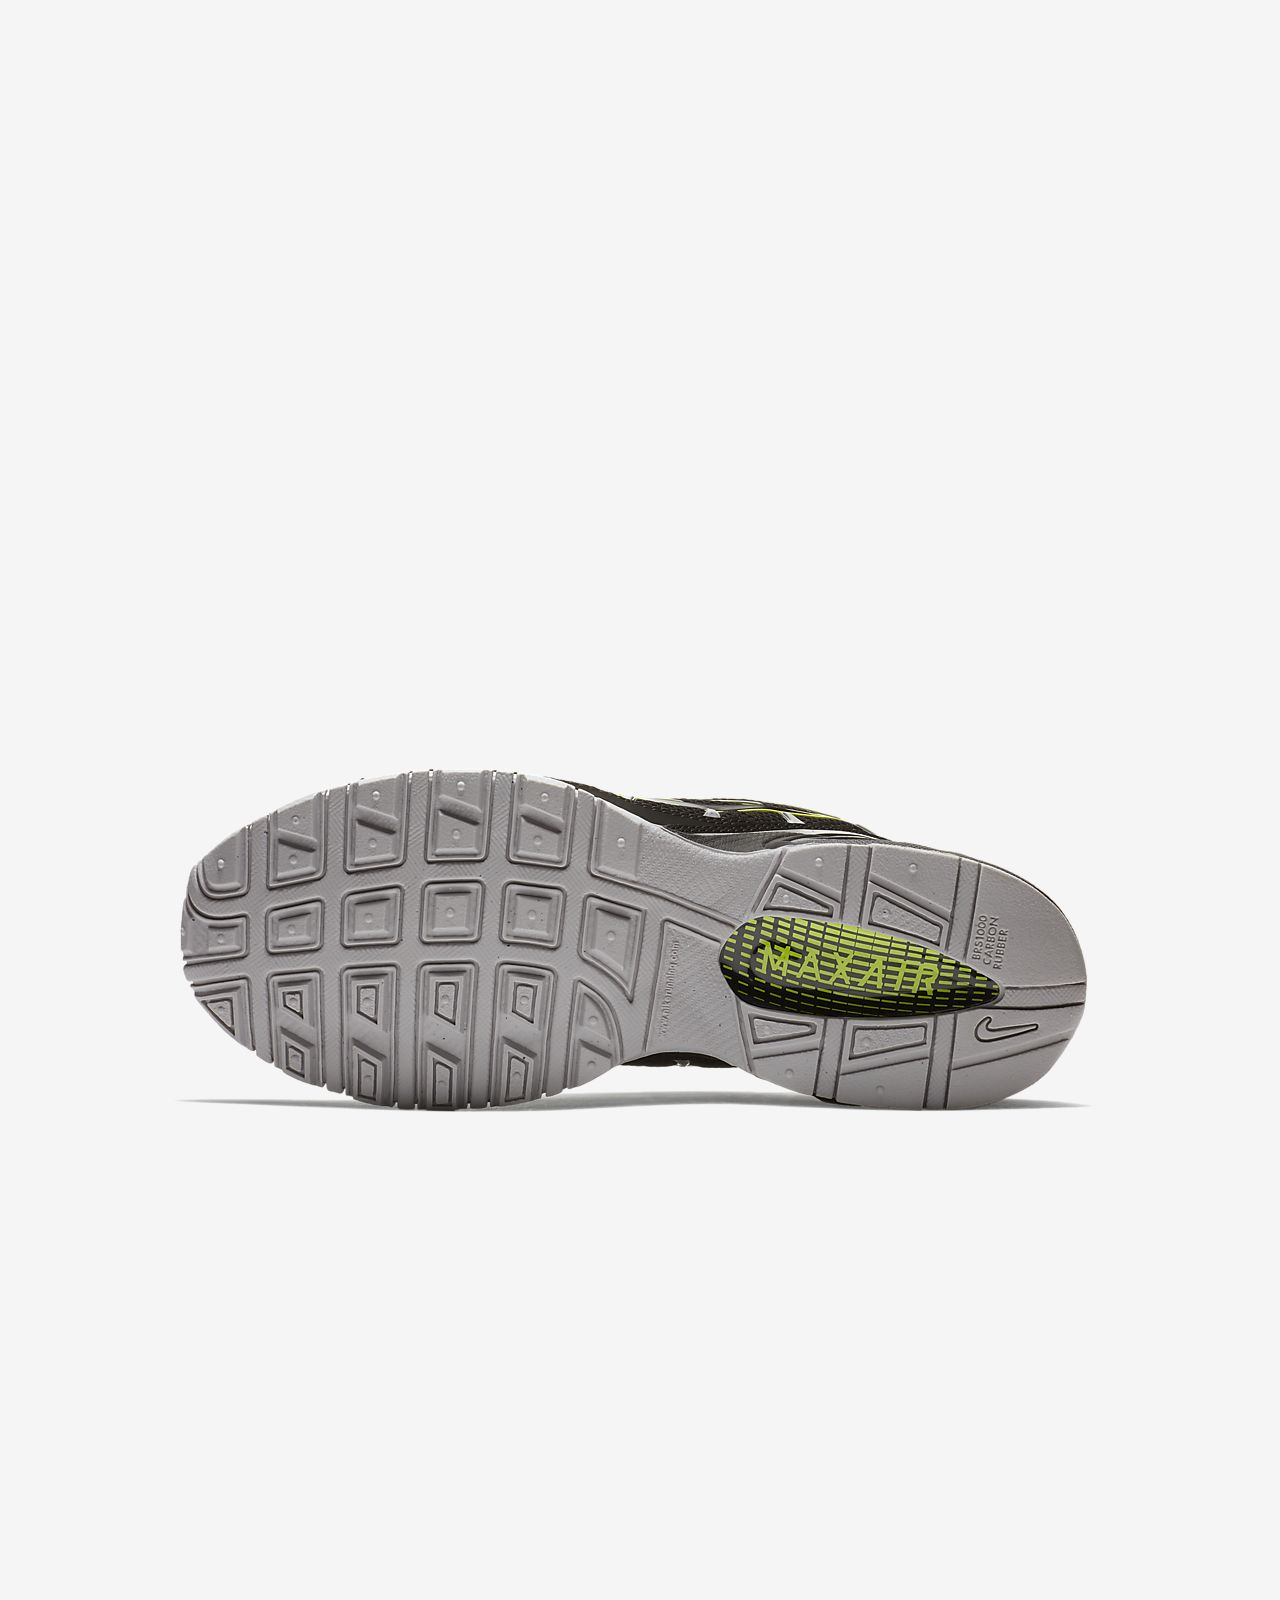 bd56c76b Nike Air Max Torch 4 Men's Running Shoe. Nike.com CA